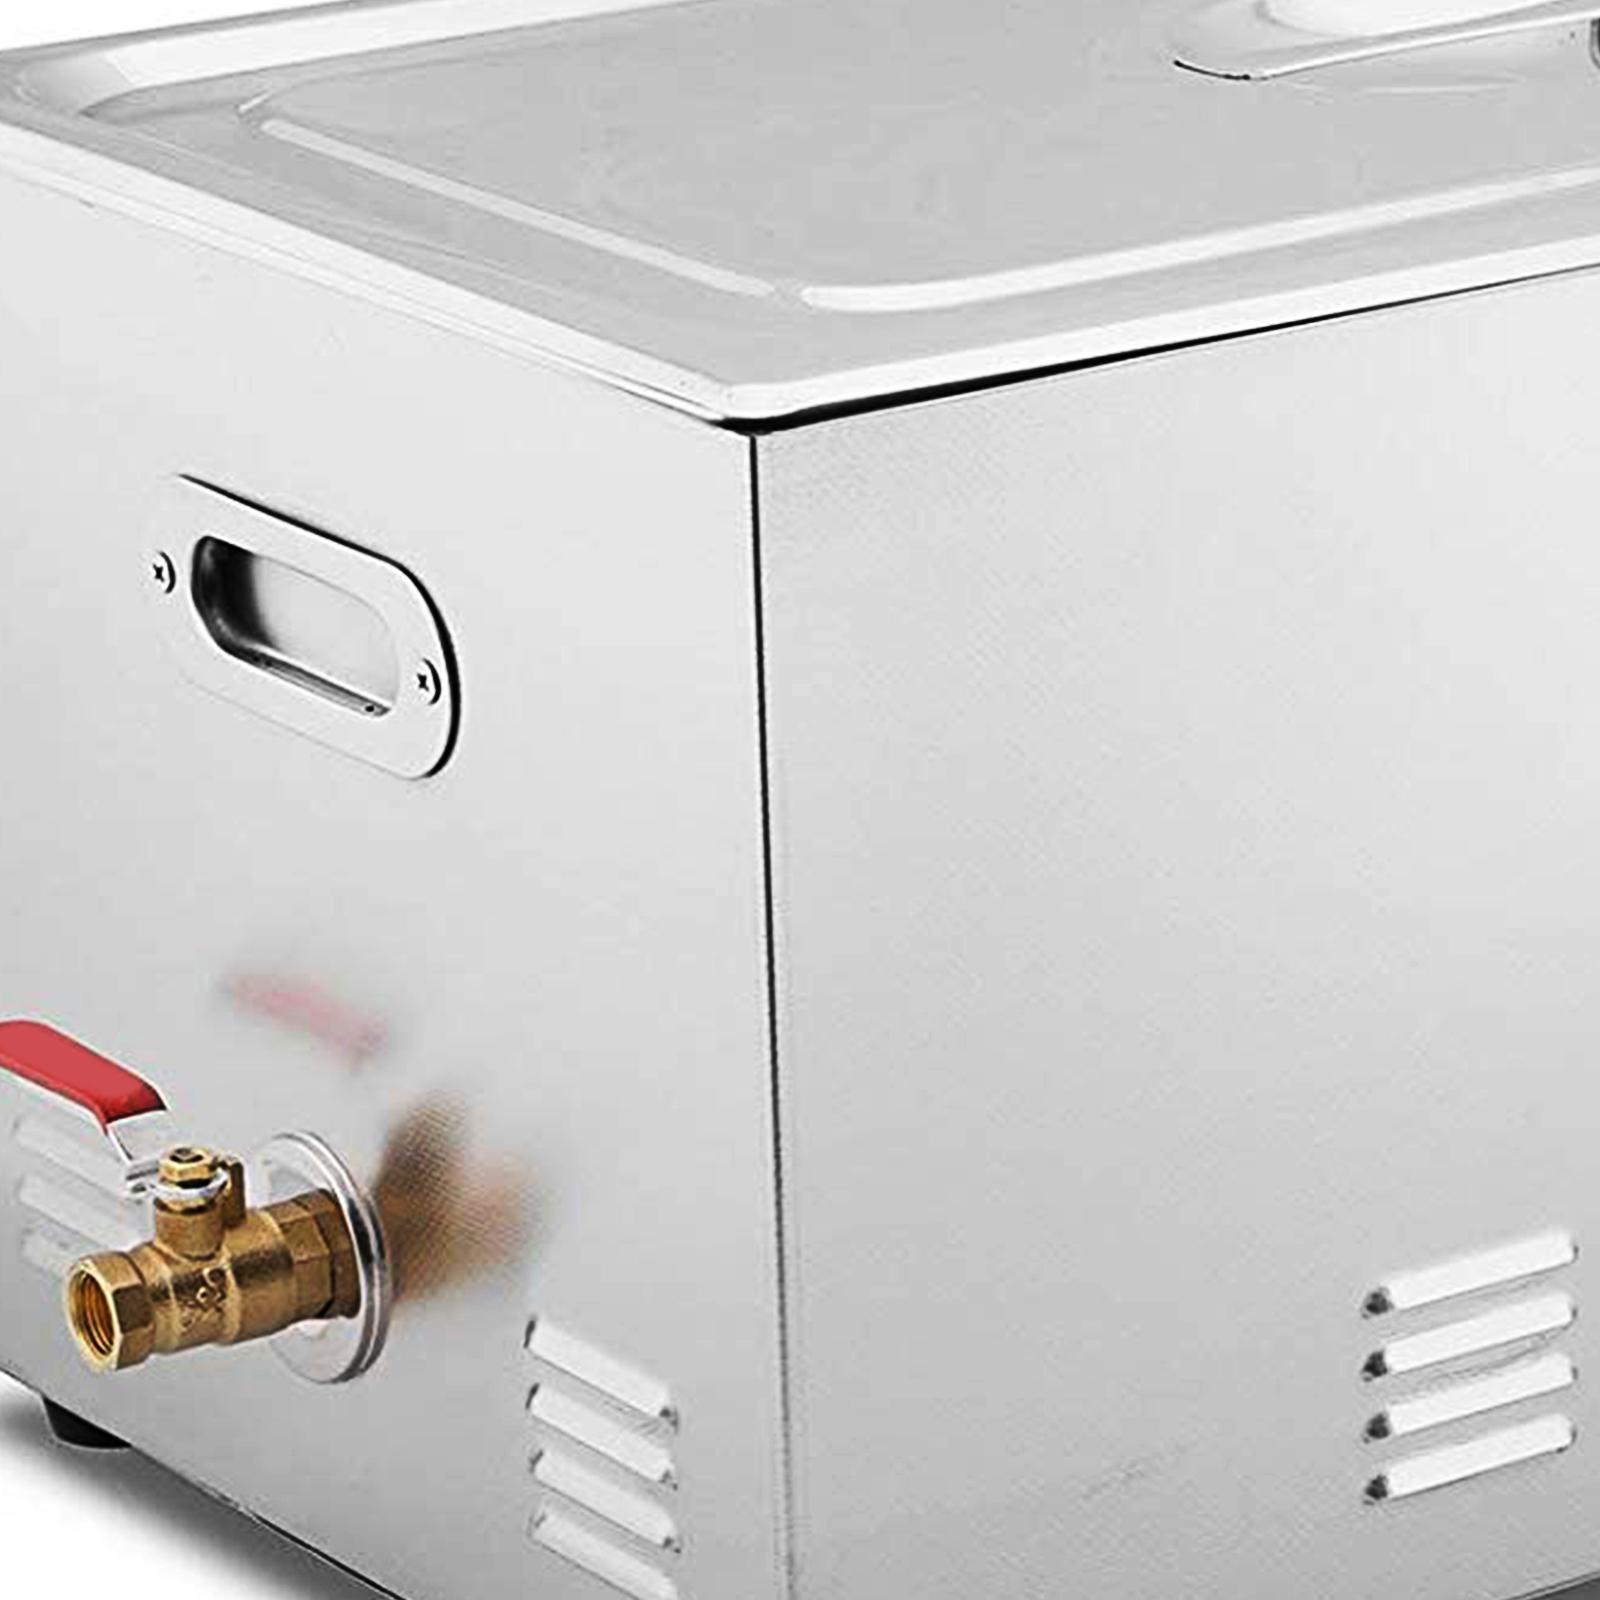 Vaschetta-Vasca-Ultrasuoni-Lavatrice-Pulitore-Ad-Ultrasuoni miniatura 91